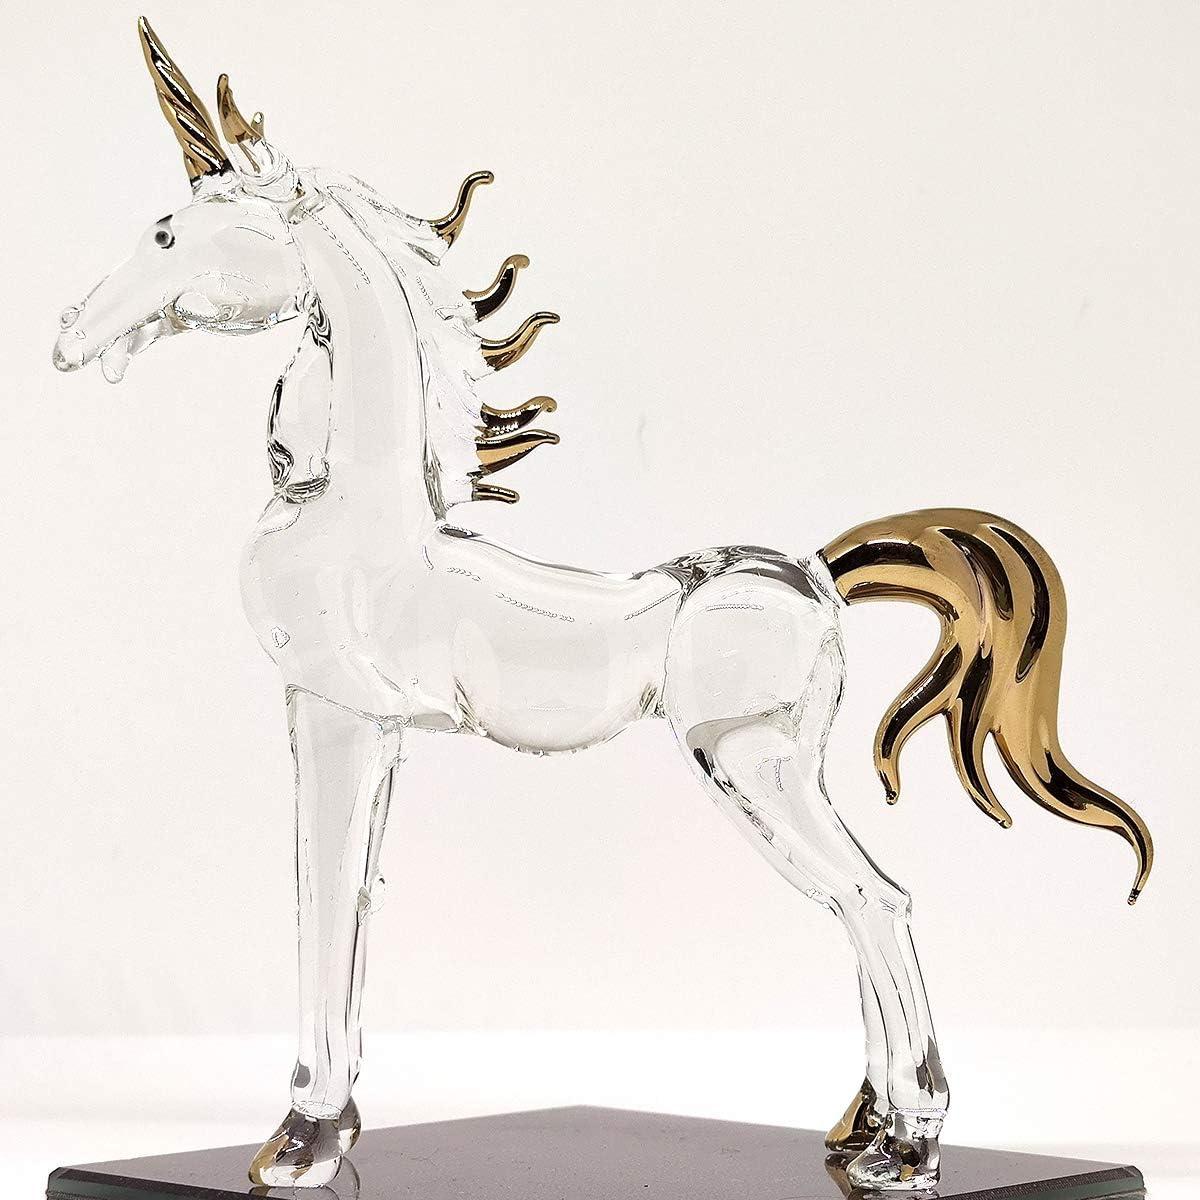 Sansukjai 6 Inches Unicorn Miniature Figurines Hand Blown Glass Art W' 22k Gold Trim Animals Collectible Gift Home Decor, Clear Gold